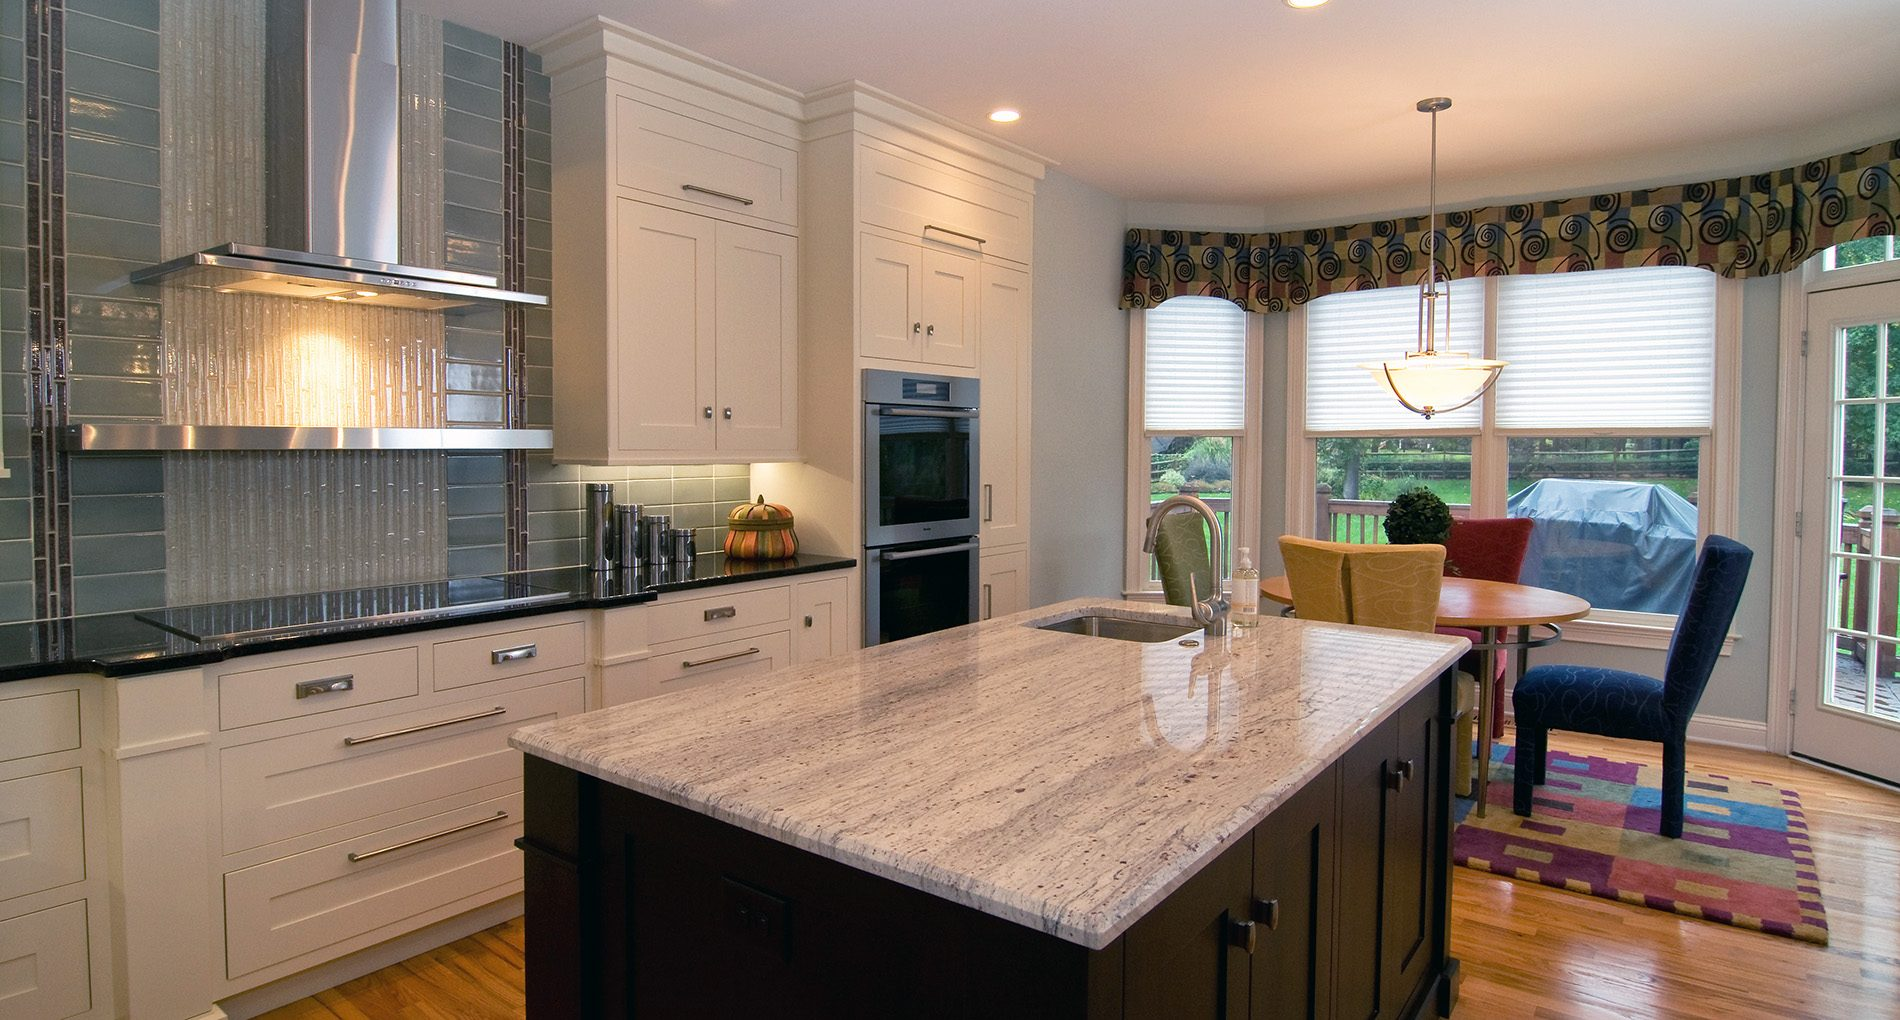 Kitchen Renovation Lakenorman Foutzviolettekitchen Slider